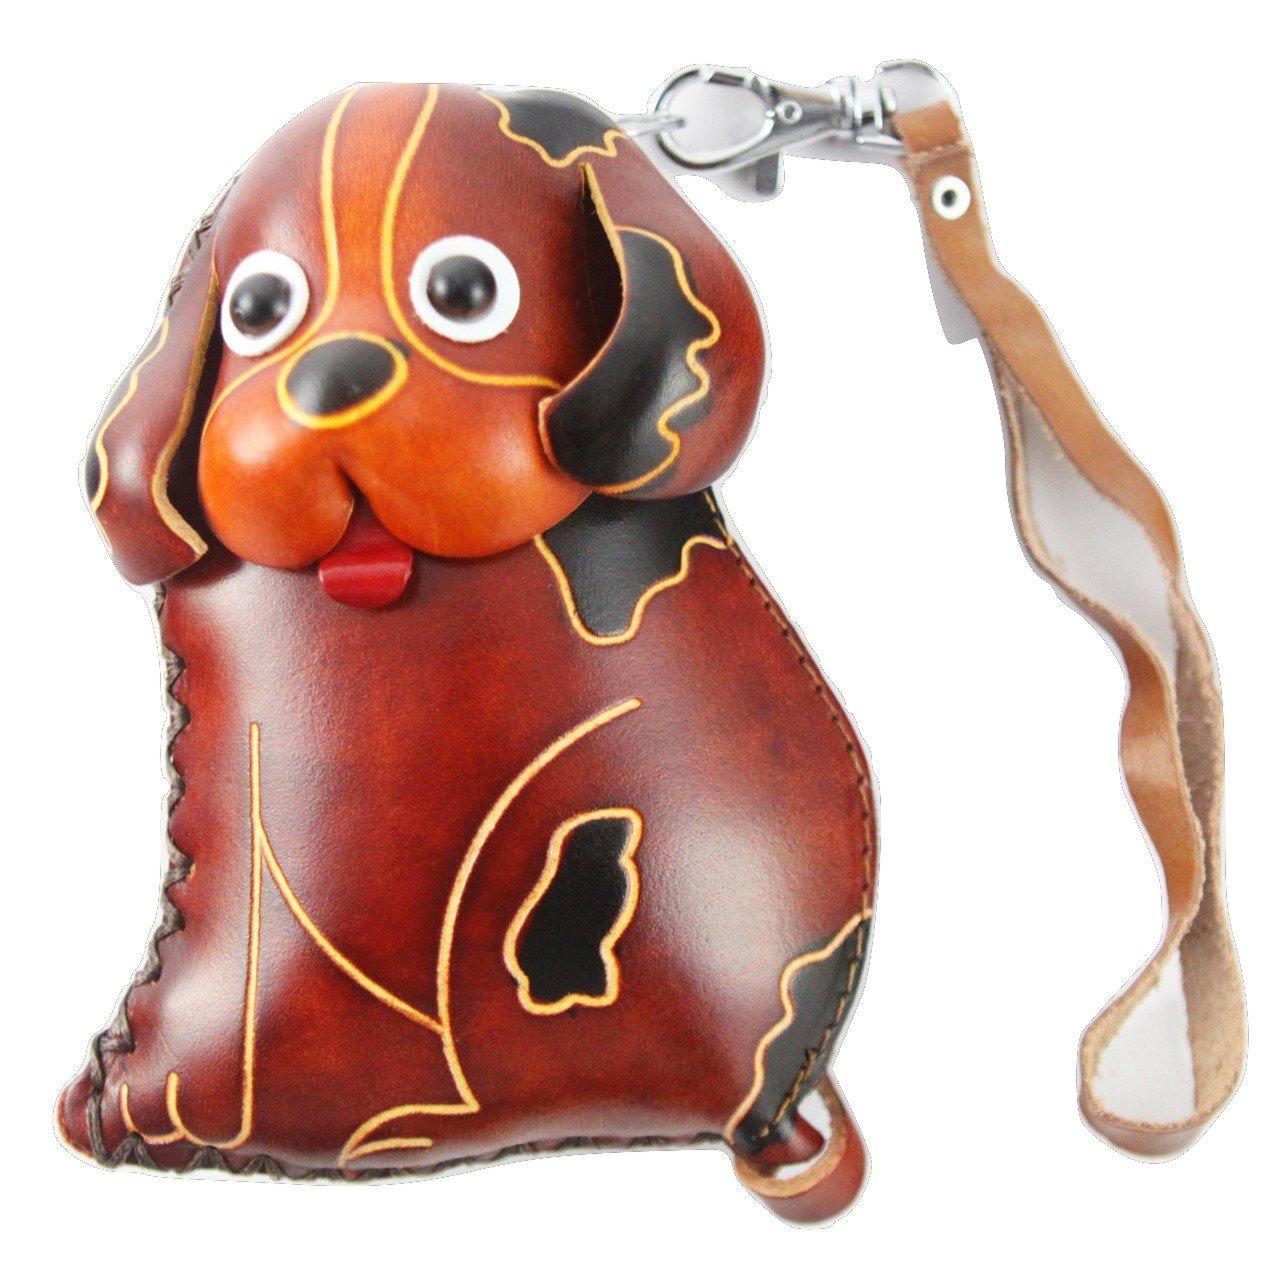 PurseWorld Women's Handmade Leather Dog Purse One Size Brown